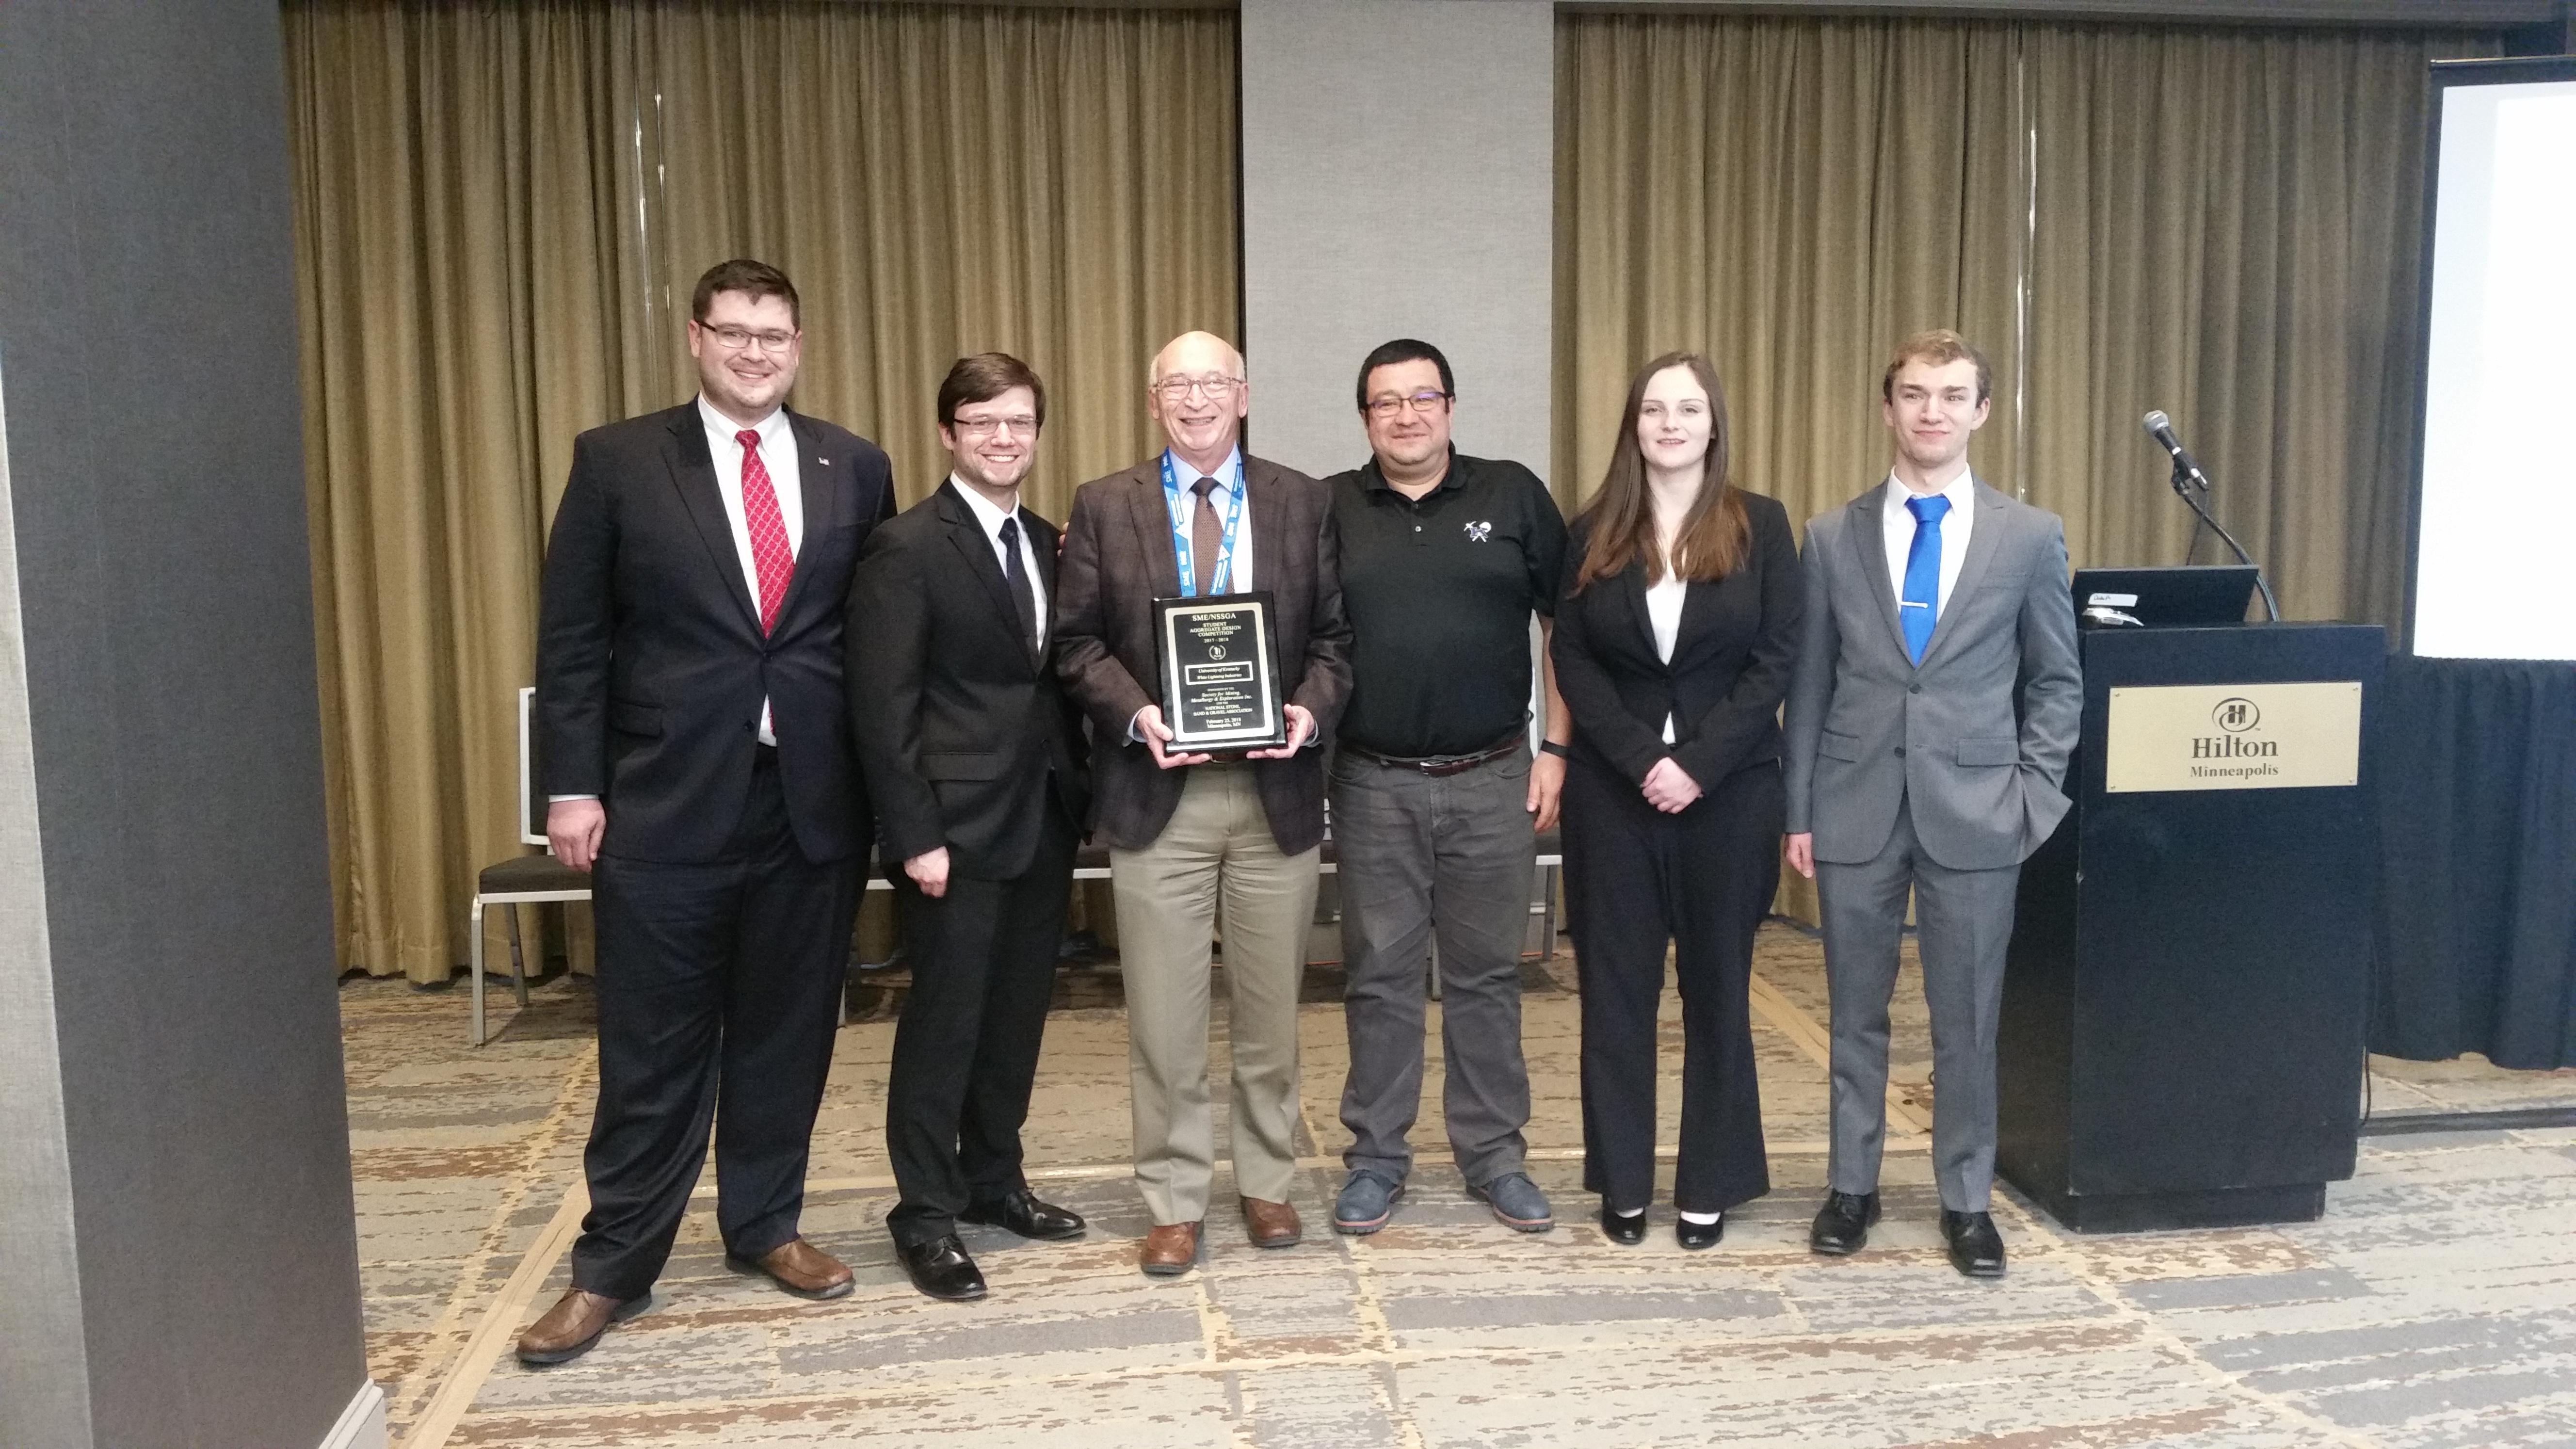 From left to right: George Thompson, Chandler Absher, Dr. Tom Novak, Dr. Jhon Silva, Hannah Parker, Trevor Rosania